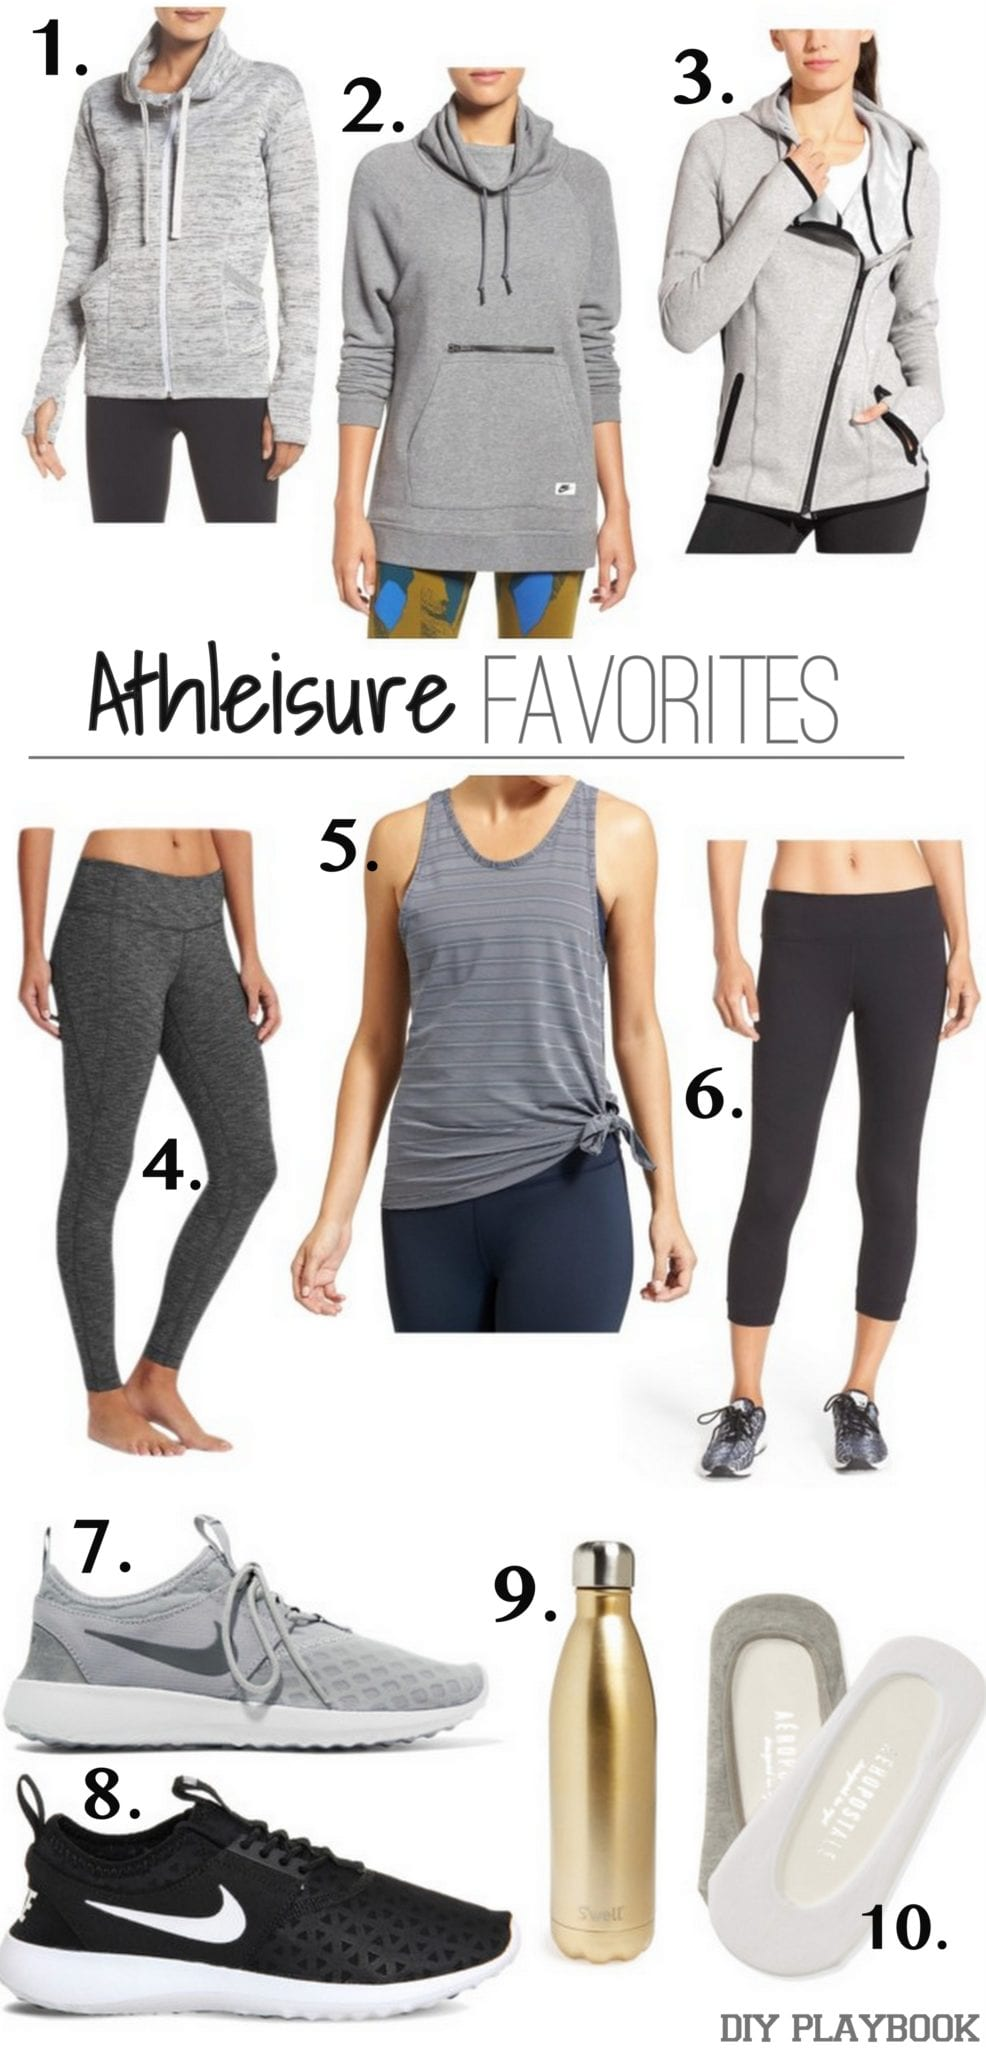 athleisure-favorites-002